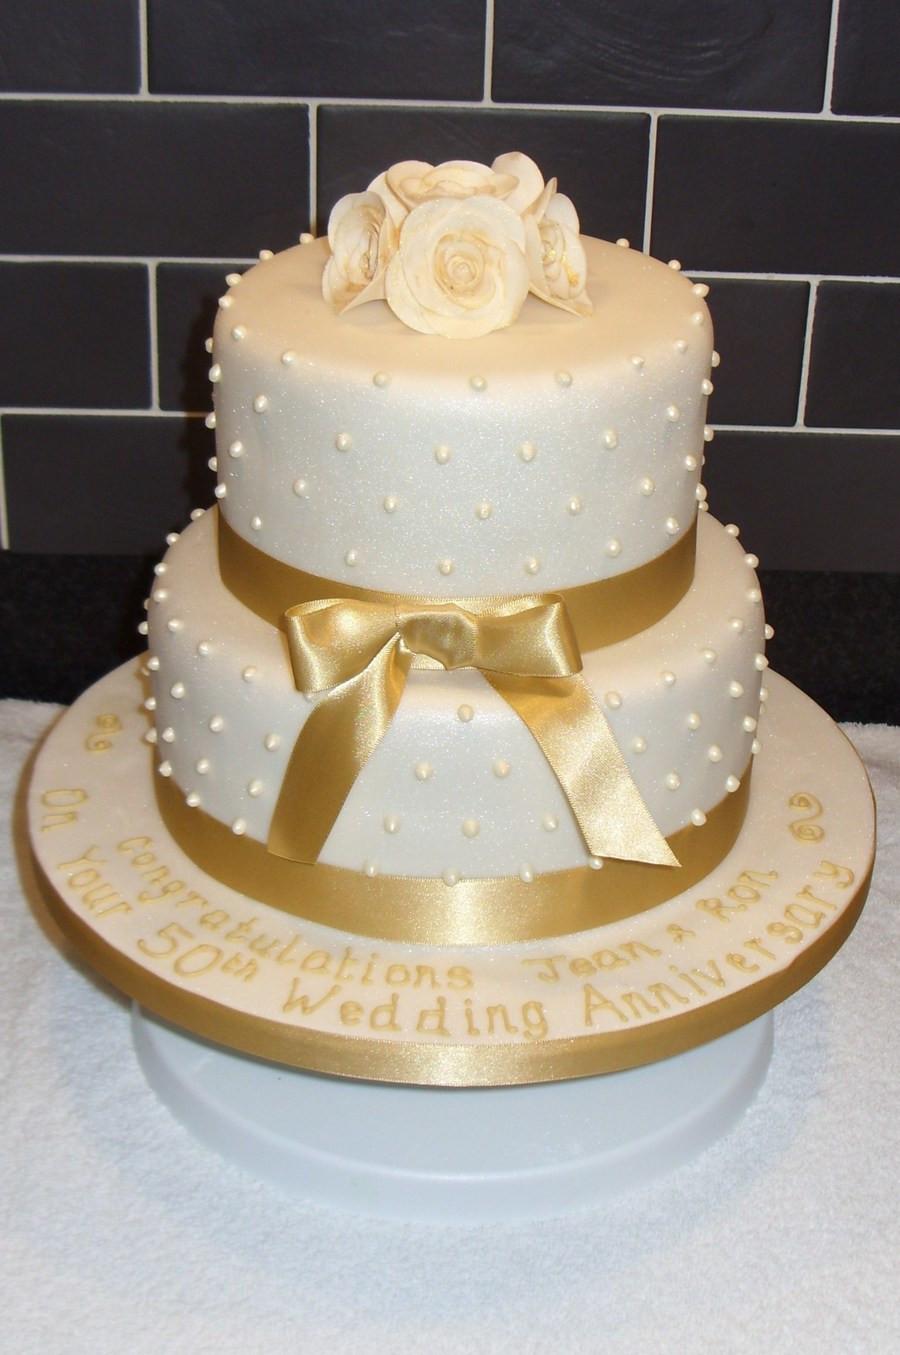 Wedding Birthday Cakes  Golden Wedding Anniversary Cake CakeCentral